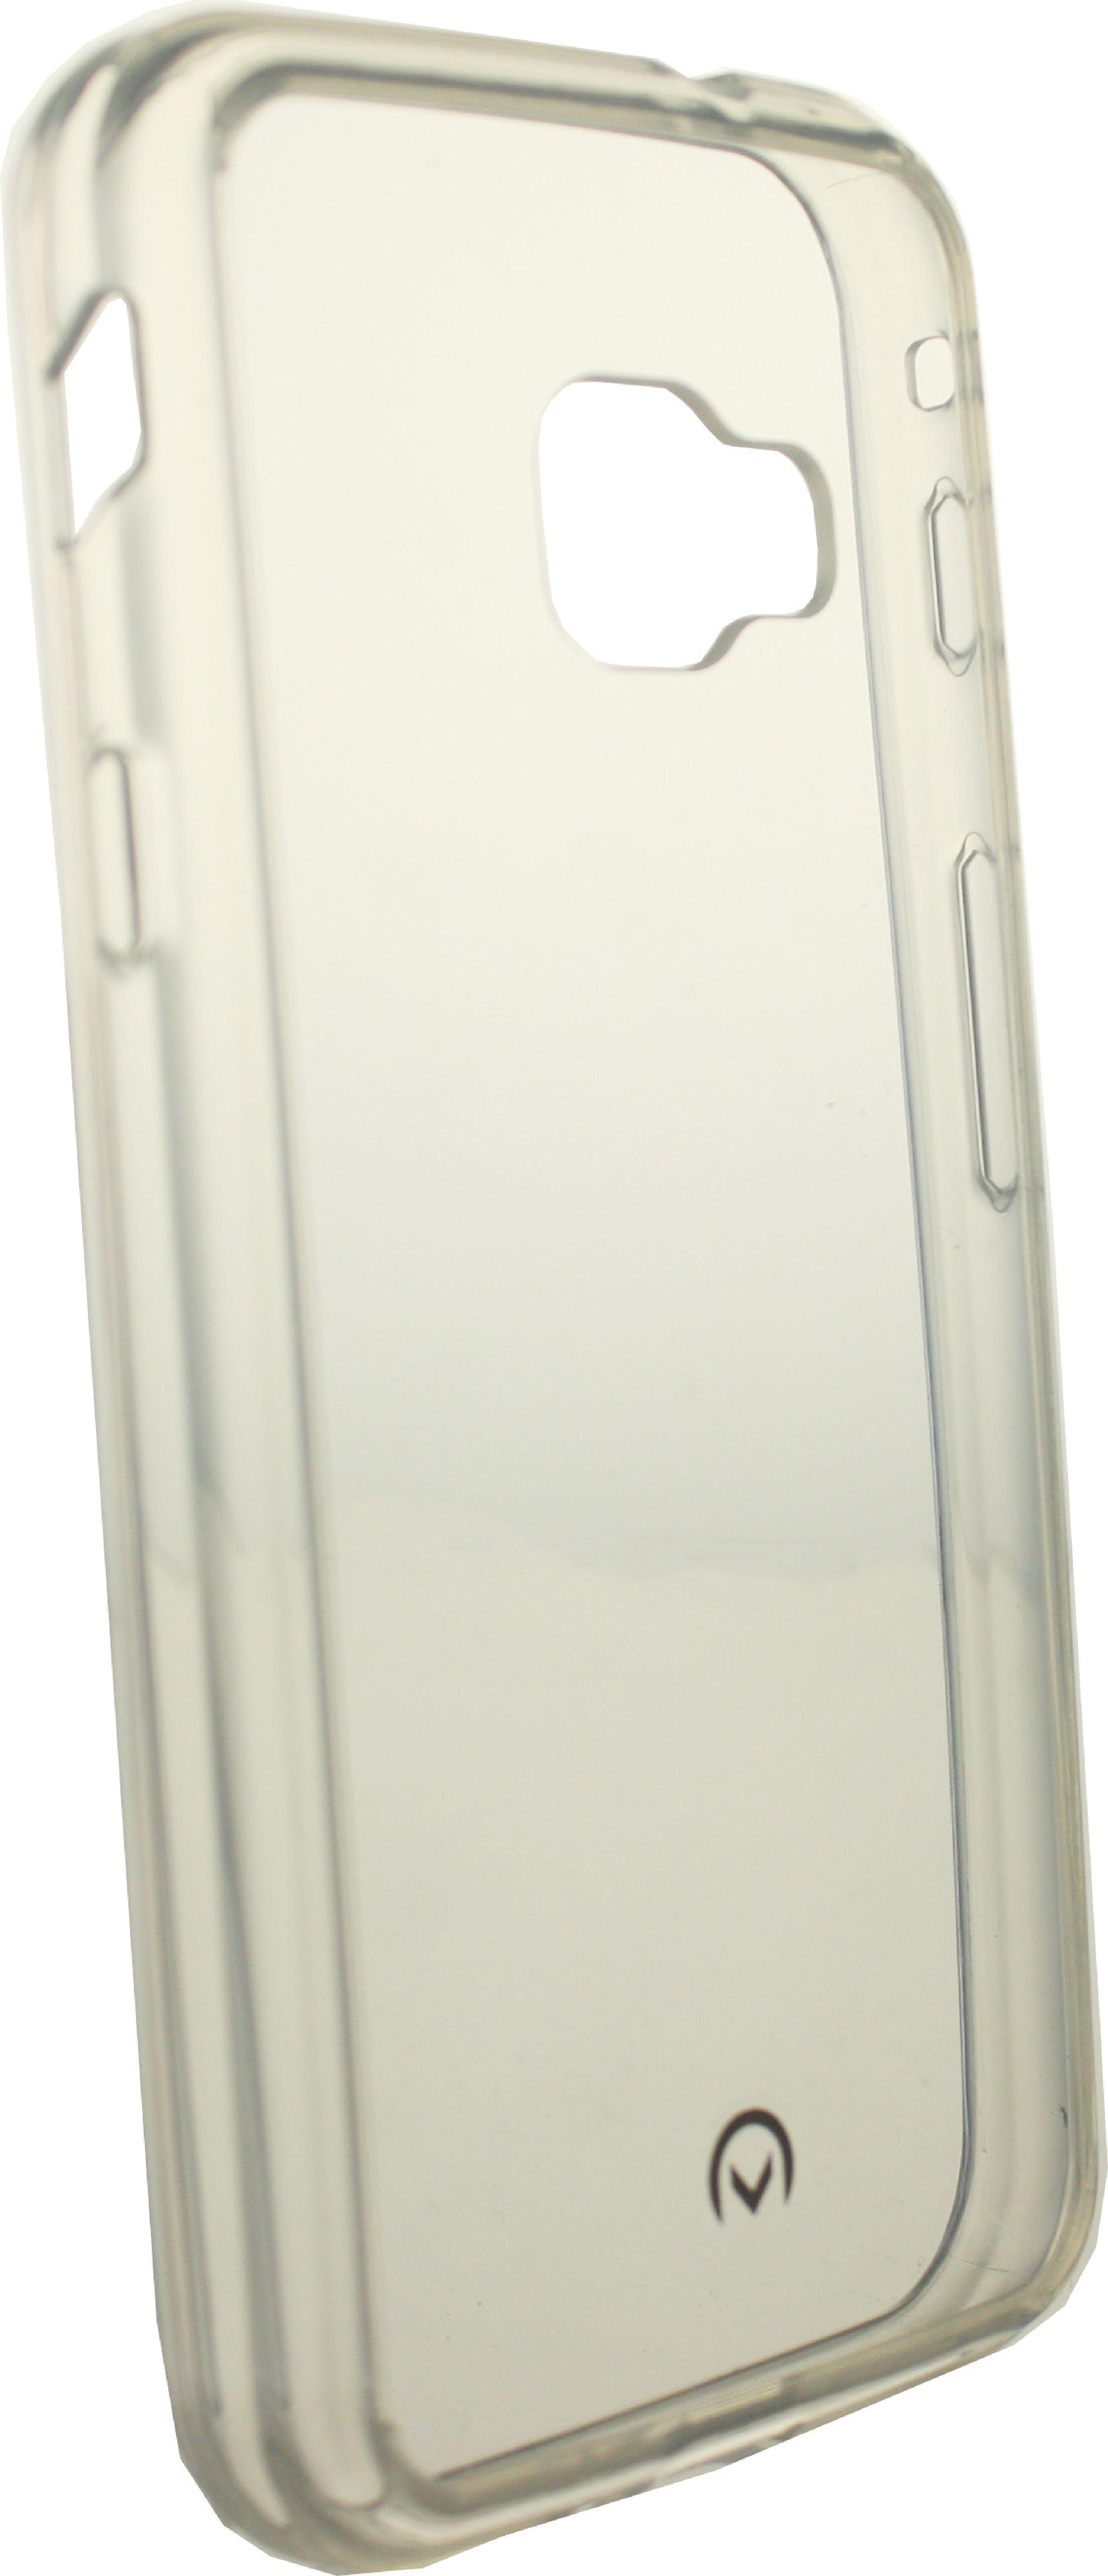 Image of   Telefon Transparent Beskyttelsesetui Samsung Galaxy Xcover 4 Gennemsigtig